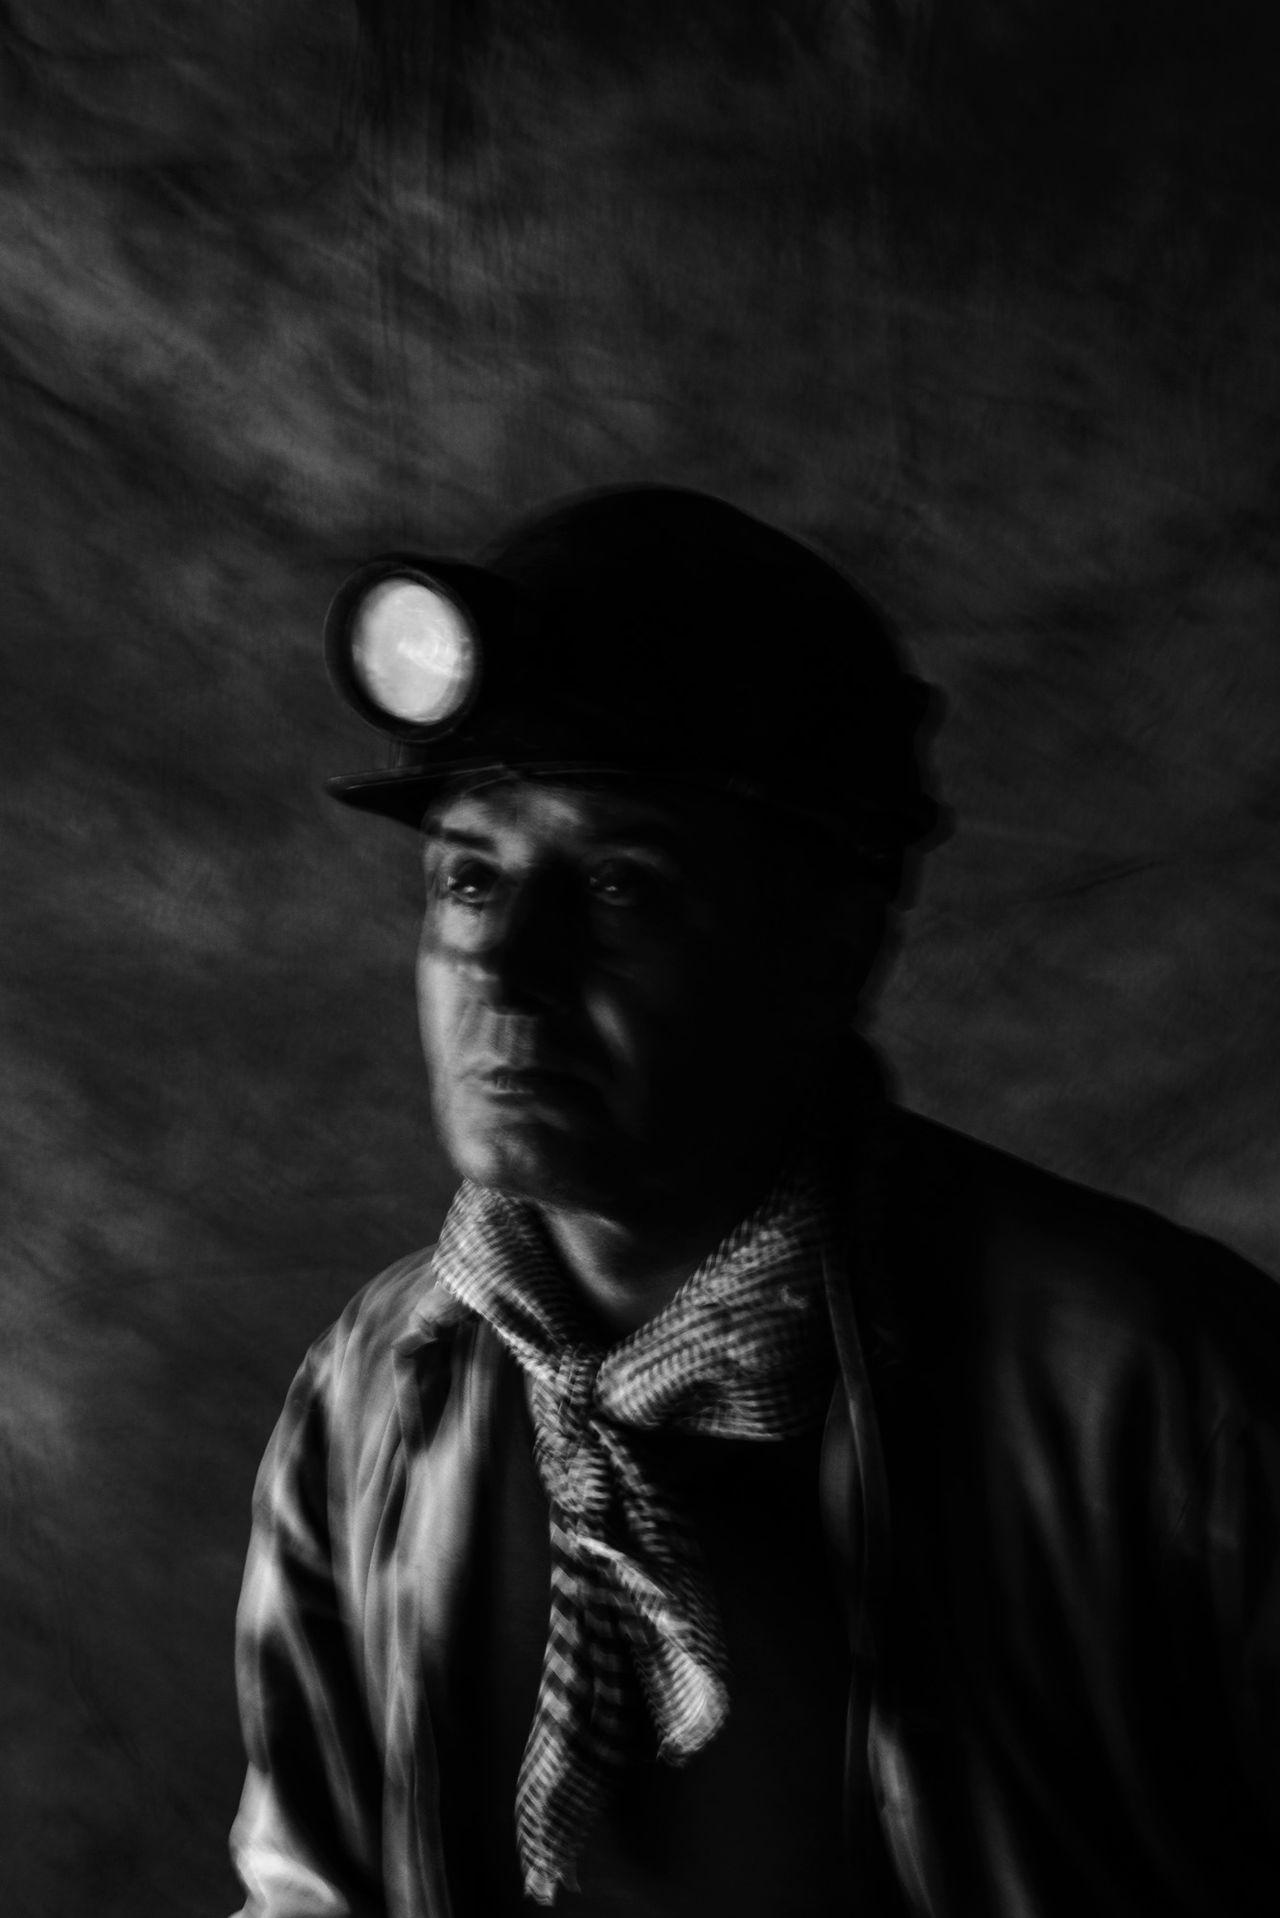 Black And White Dark Miner Mineworkers Monochrome People Portrait The Portraitist - 2017 EyeEm Awards Worker